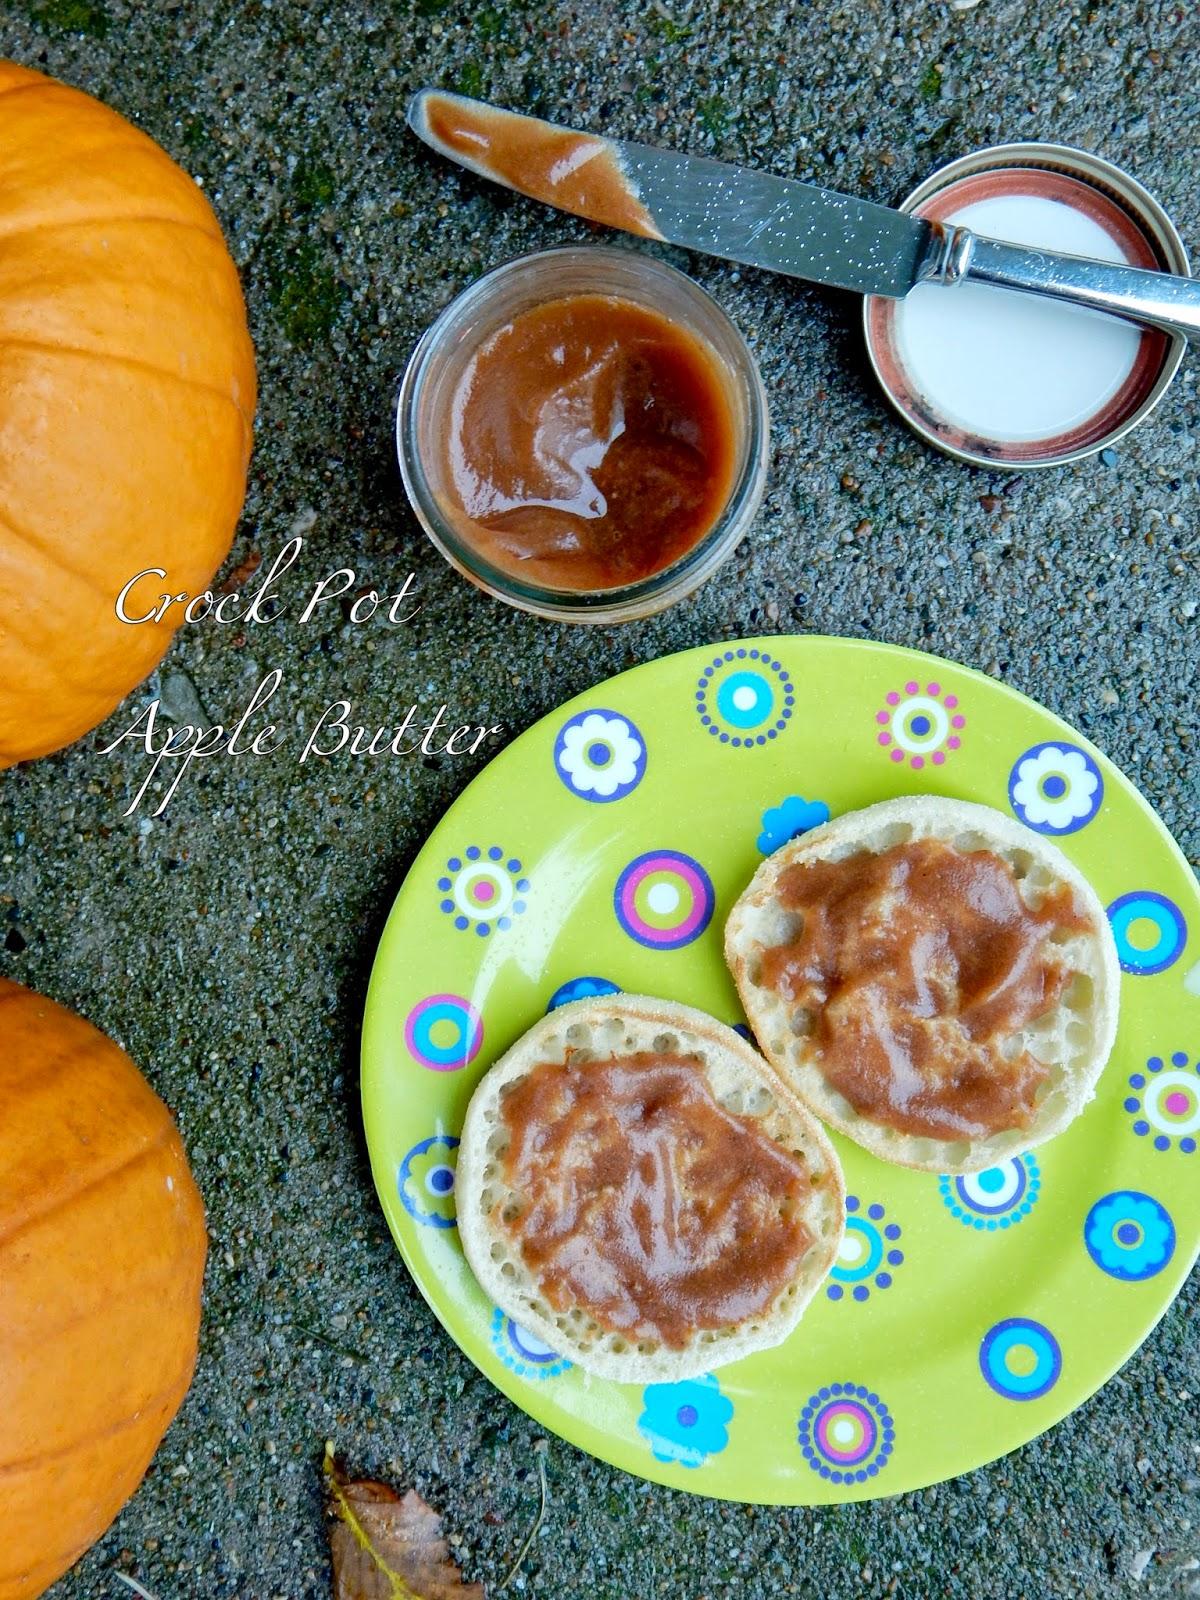 crock pot apple butter (sweetandsavoryfood.com)